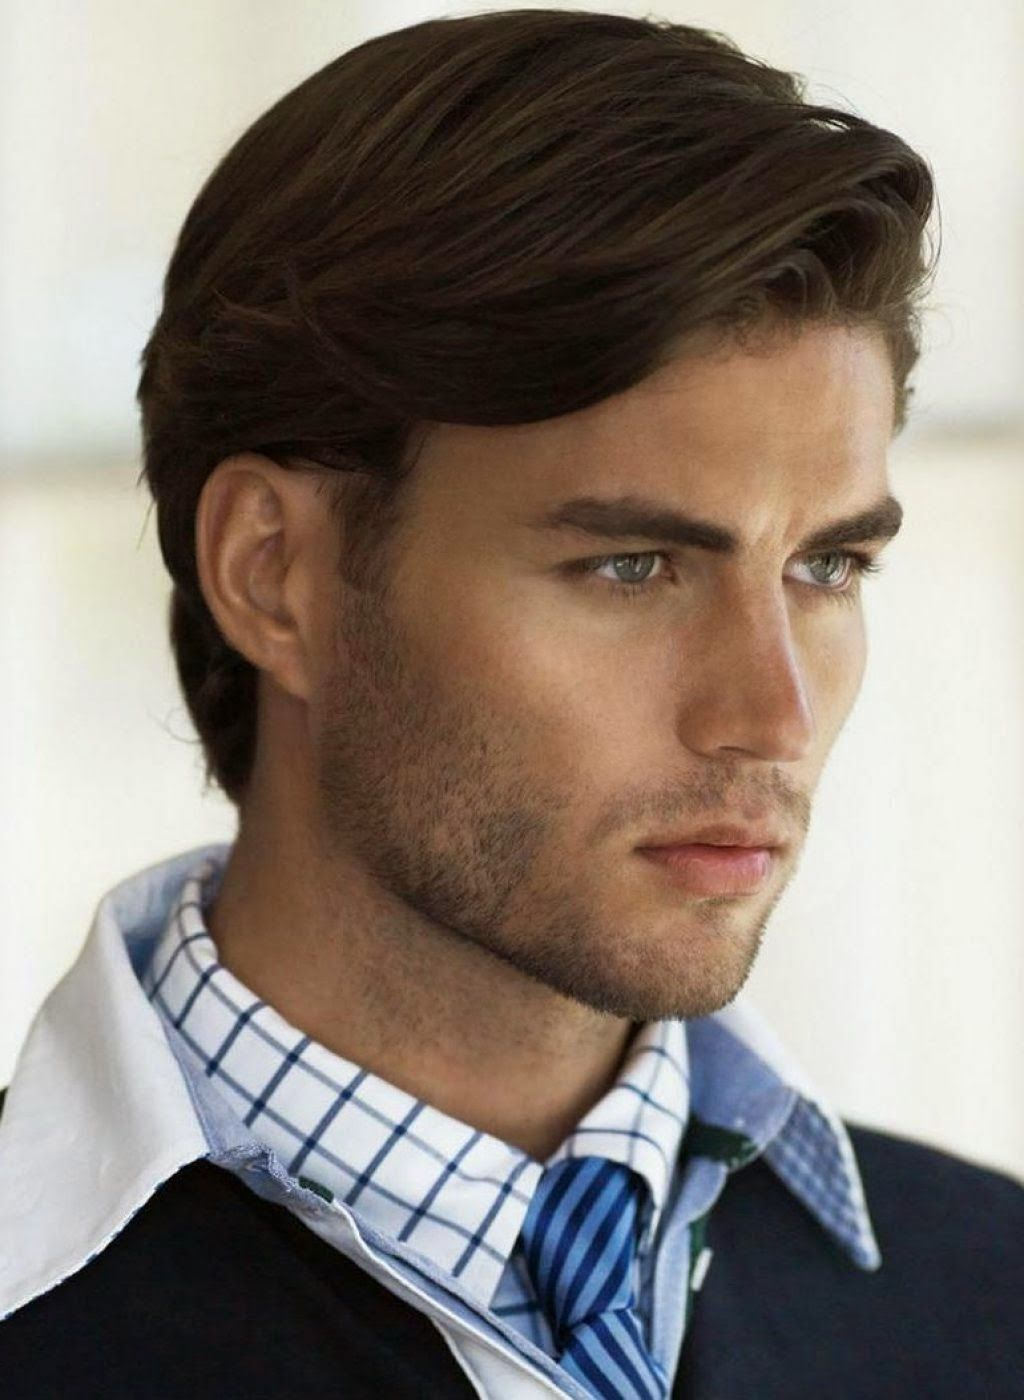 Corte de cabello largo caballero